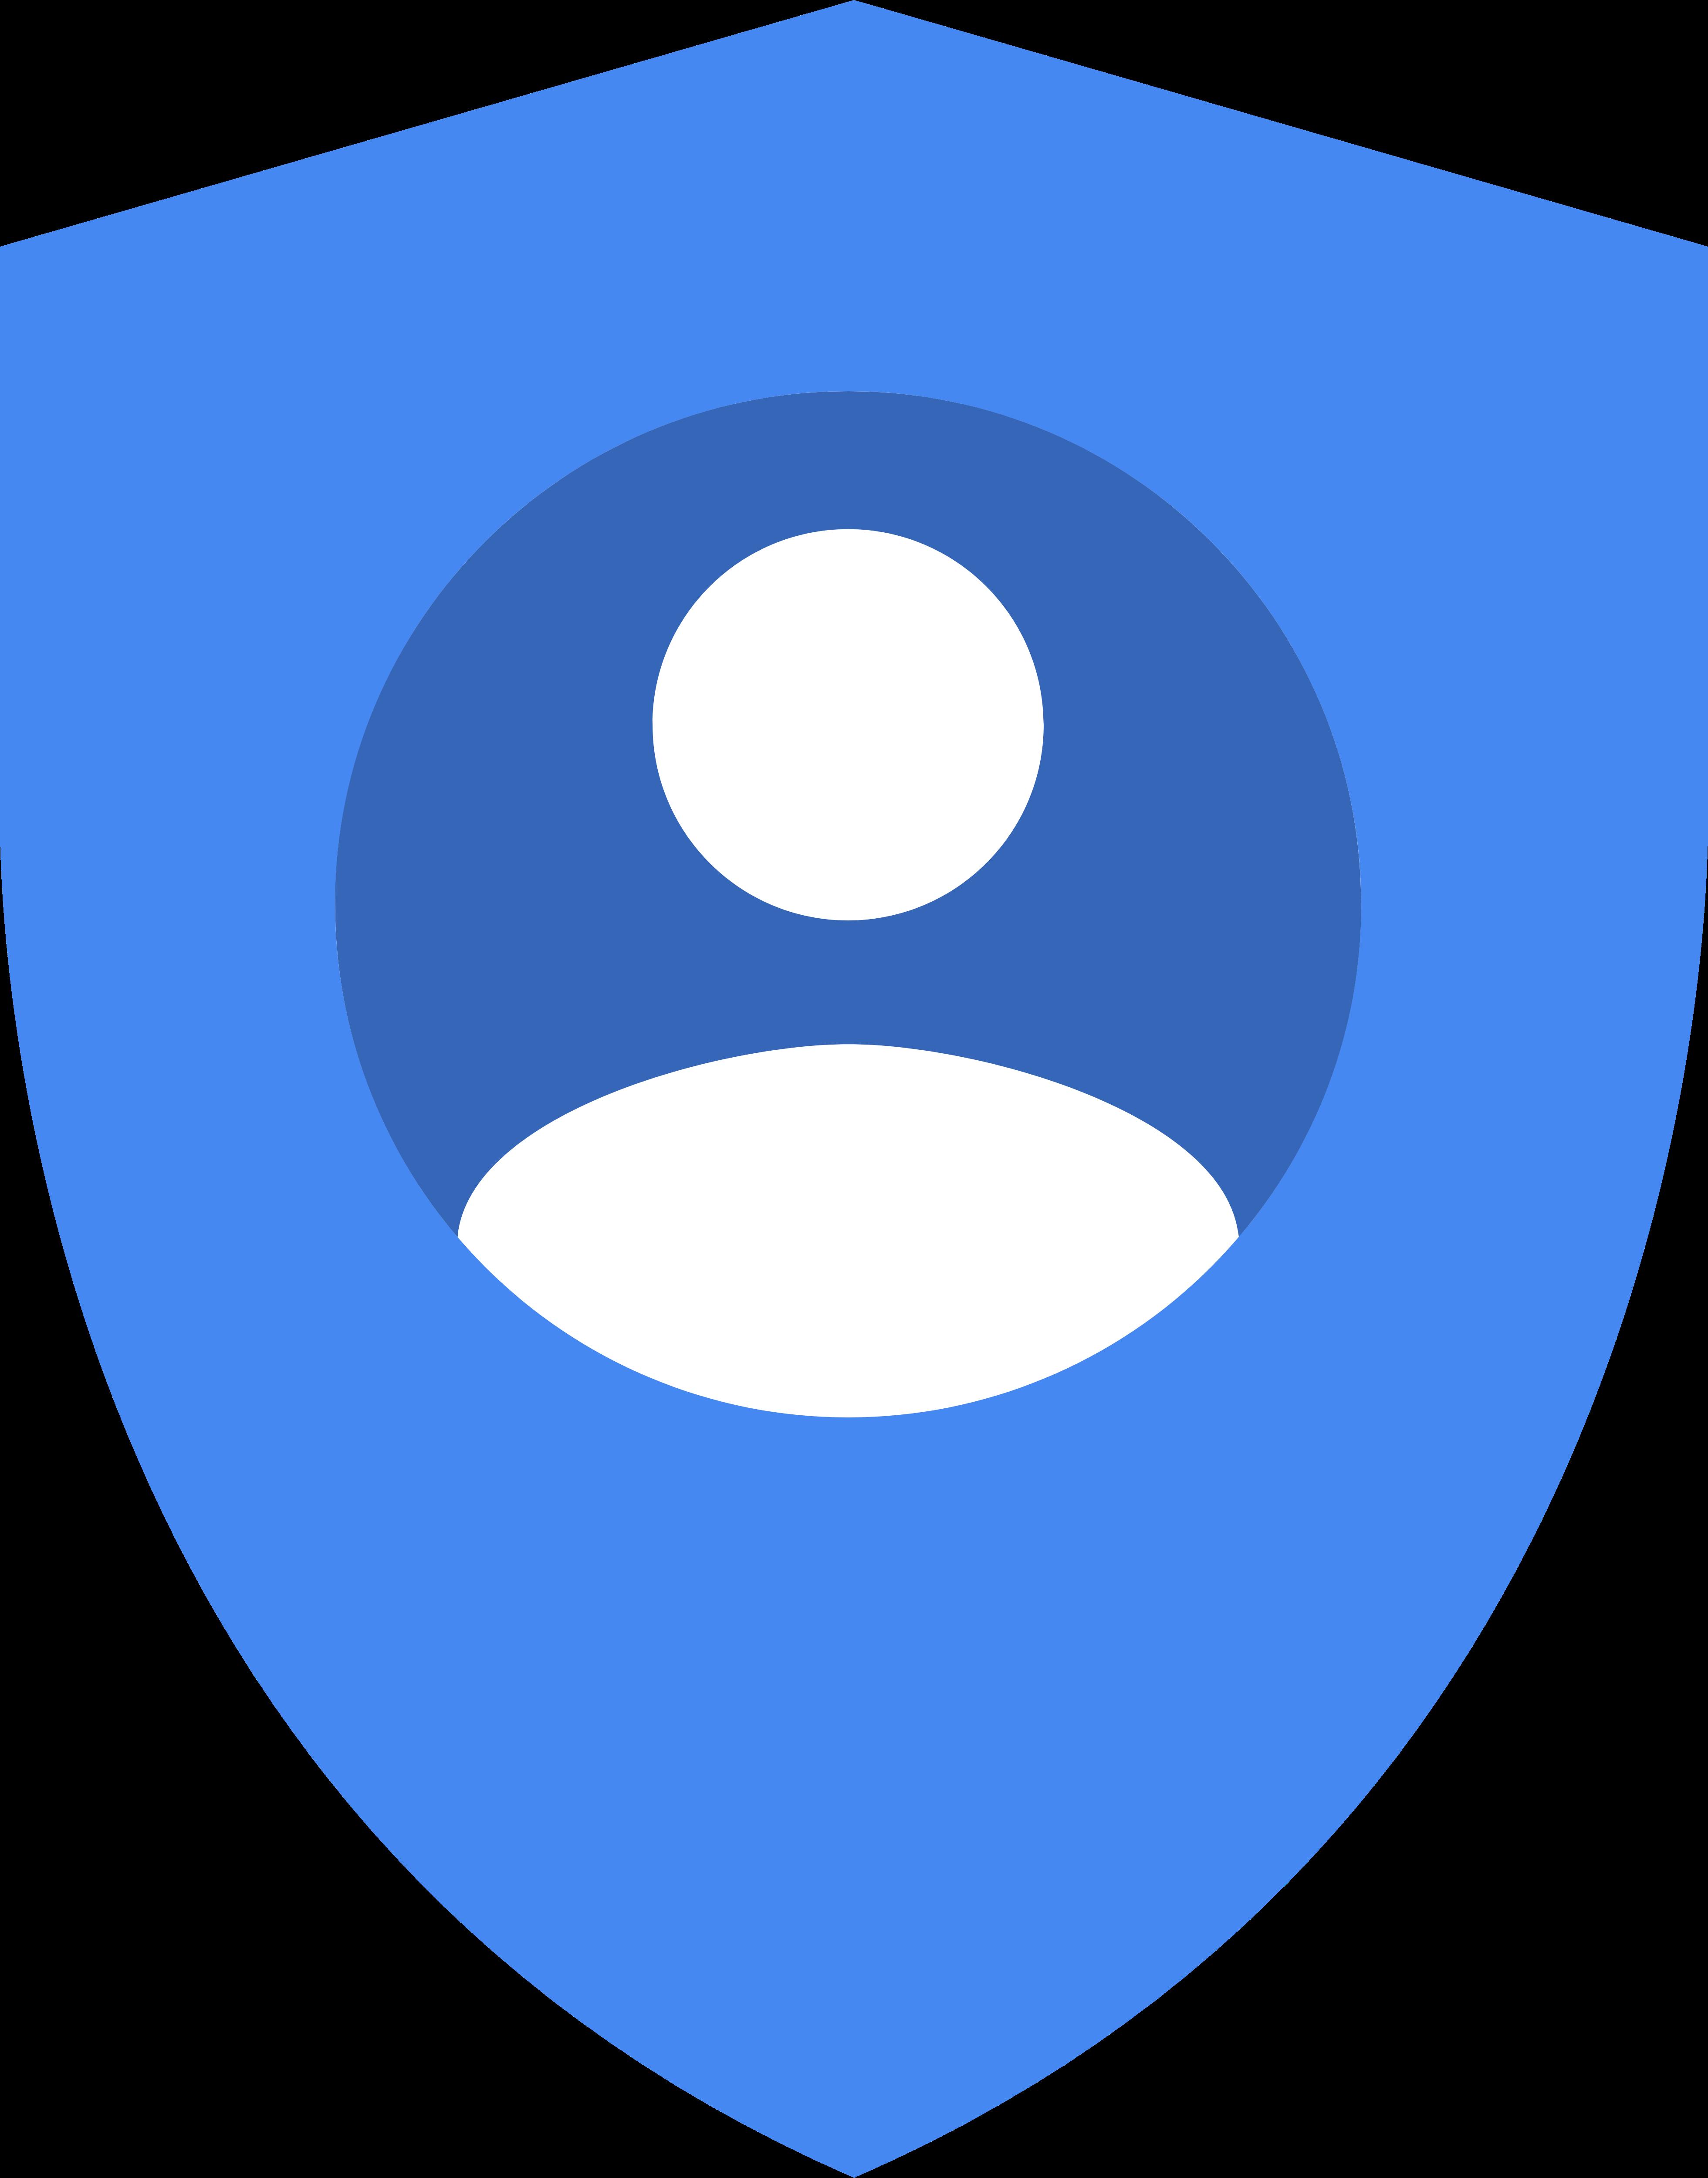 GOOGLE adds – Logos Download - Blue Google Logo